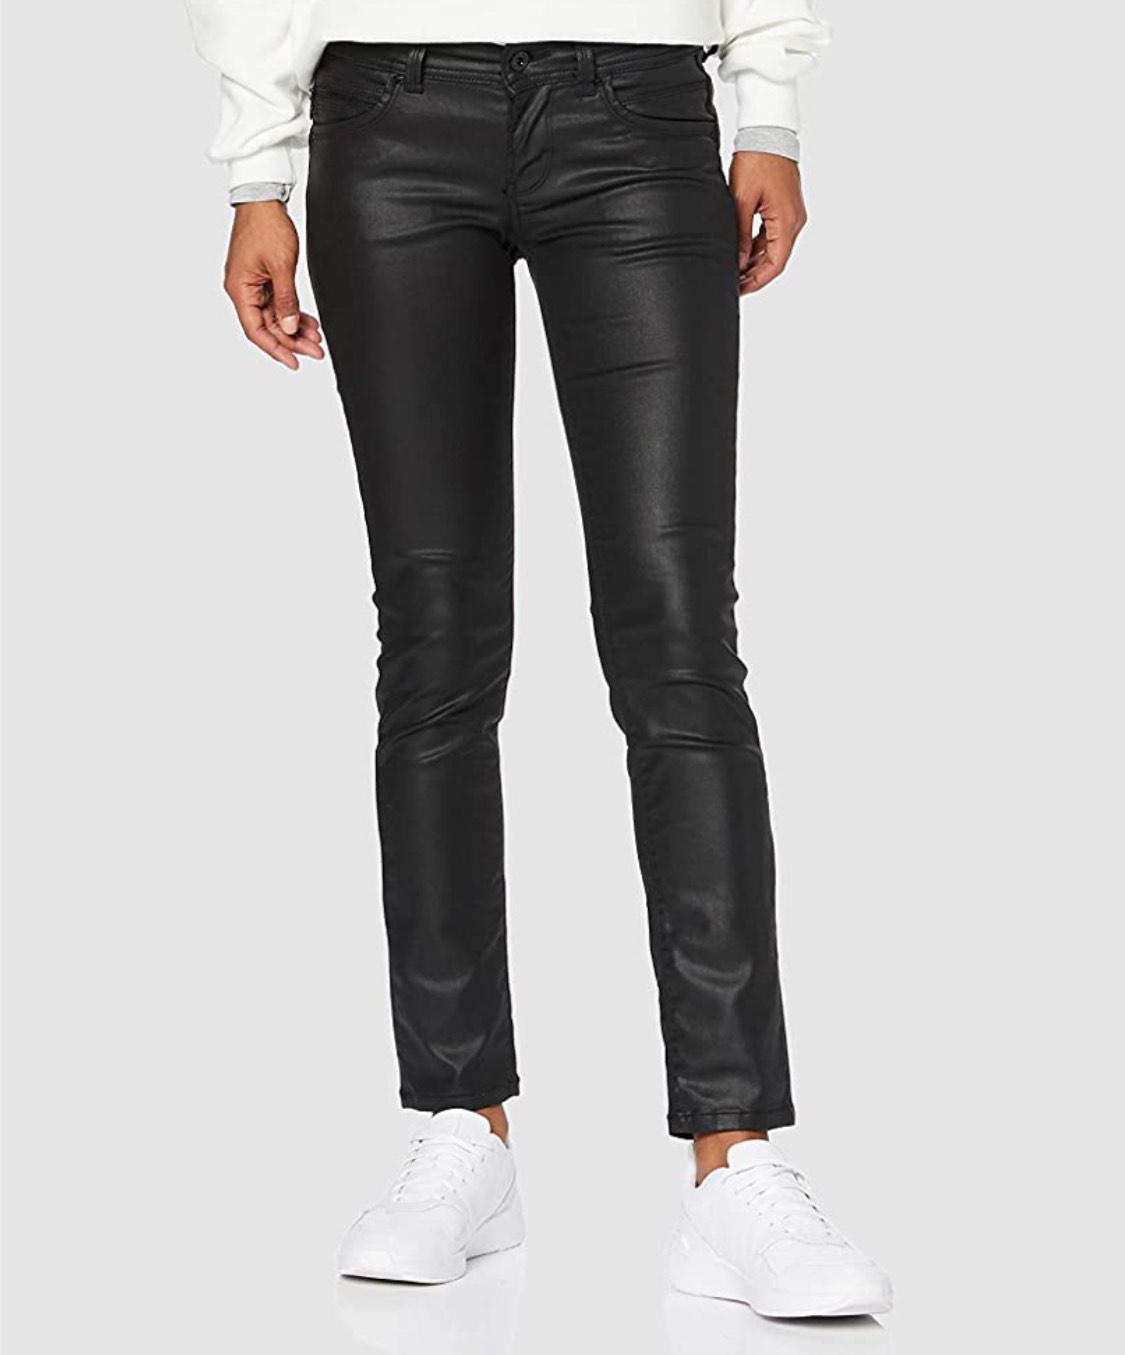 Pantalones Pepe Jeans efecto piel mujer talla 34W/34L (44 largo)